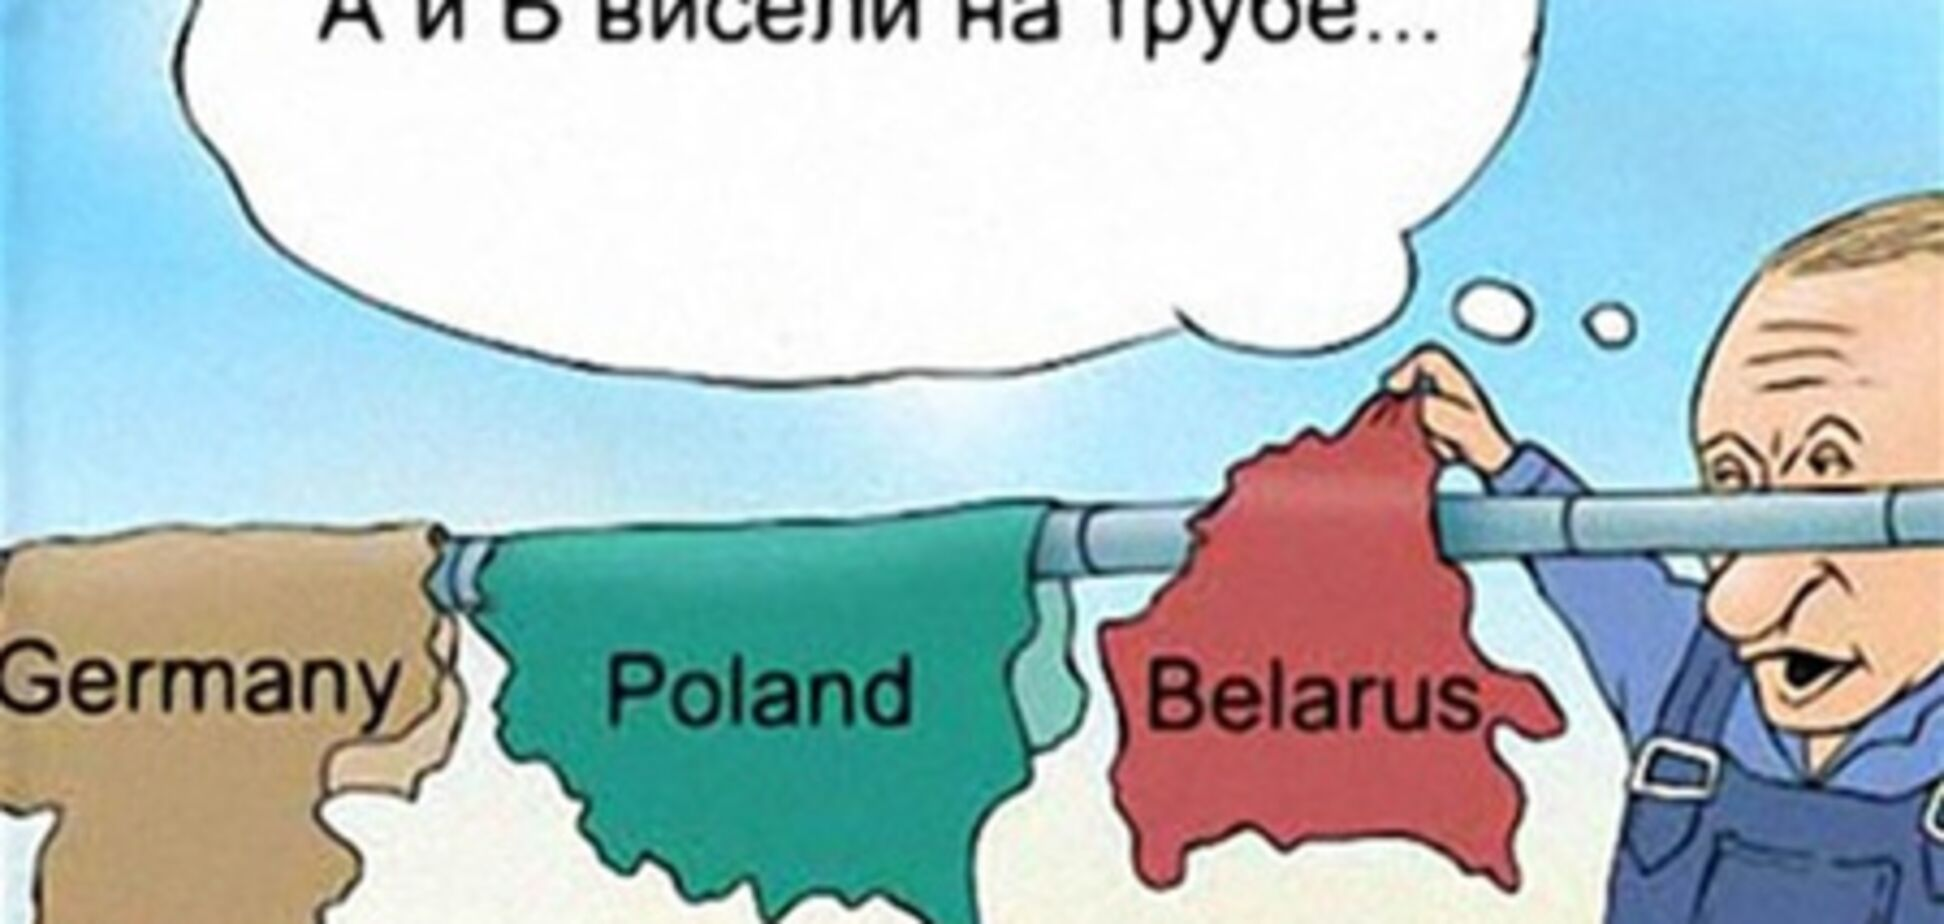 'Ямал-Европа-2'. Прогнётся ли Украина под 'Газпромом'?